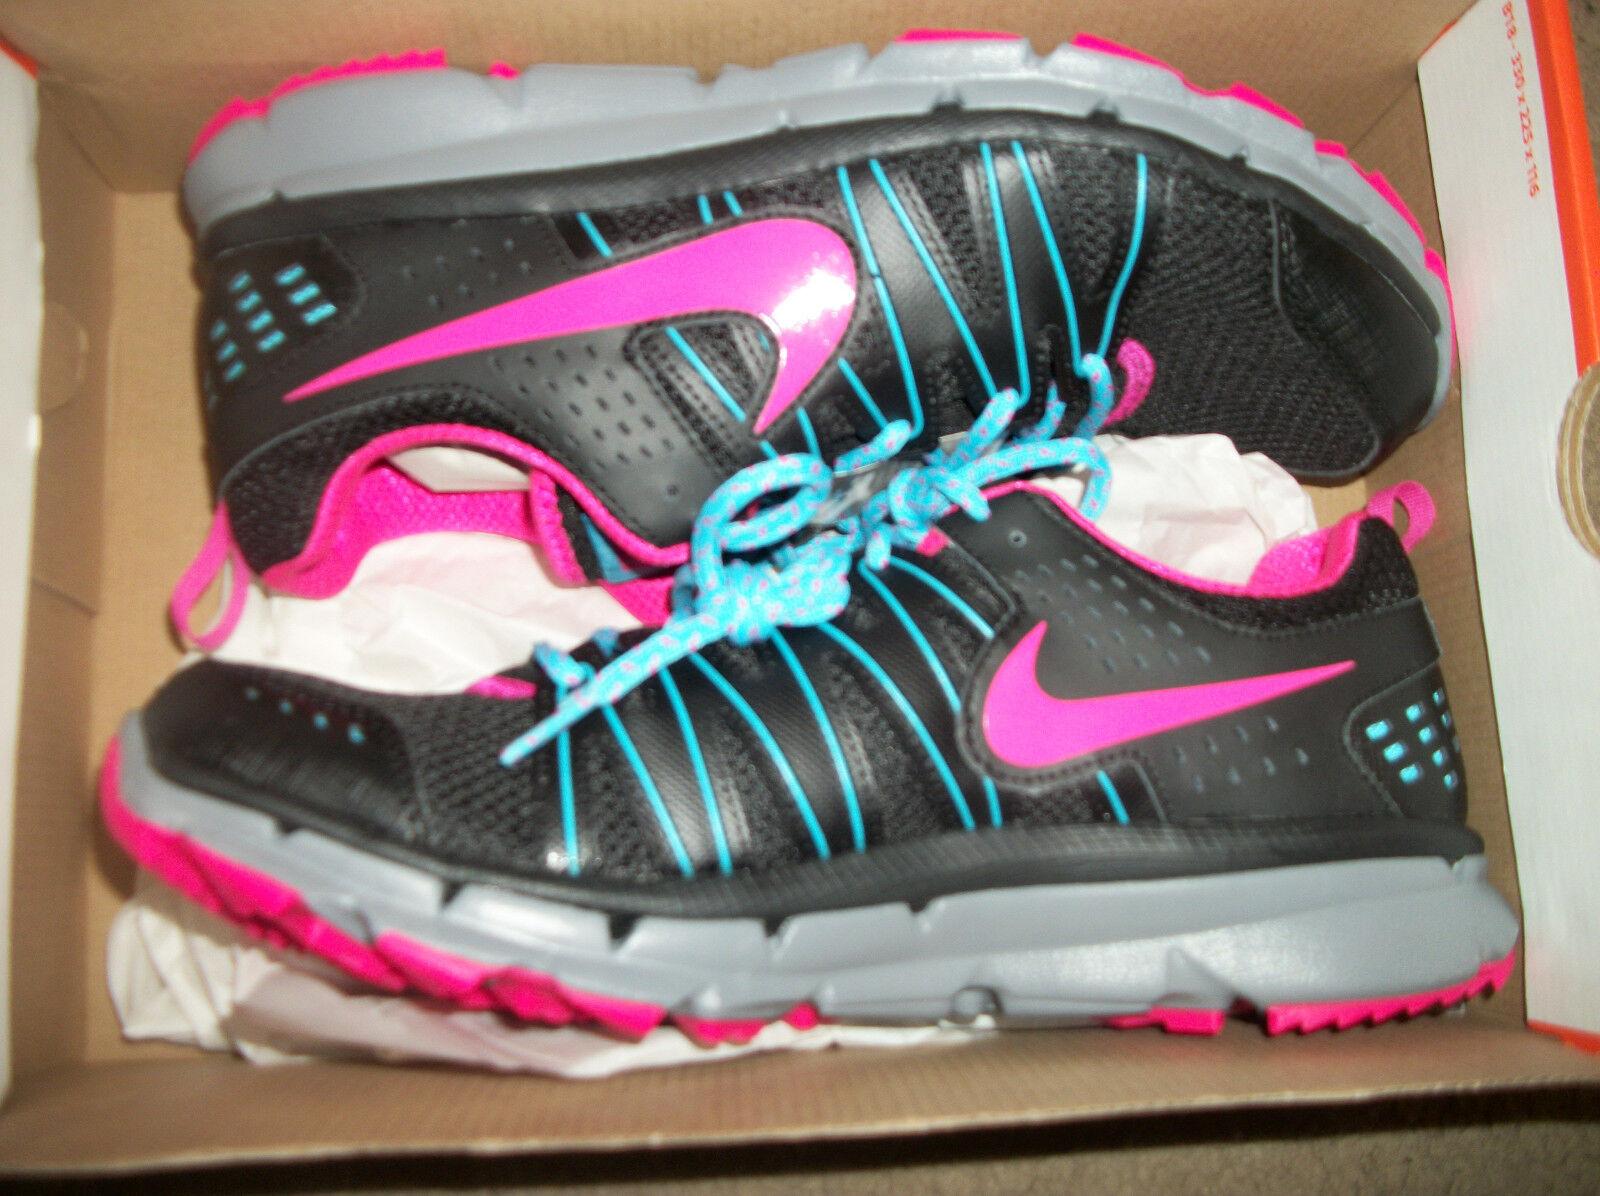 Nike Mujer Flex Trail Rosa 2 Nuevo Negro Azul Rosa Trail 230501